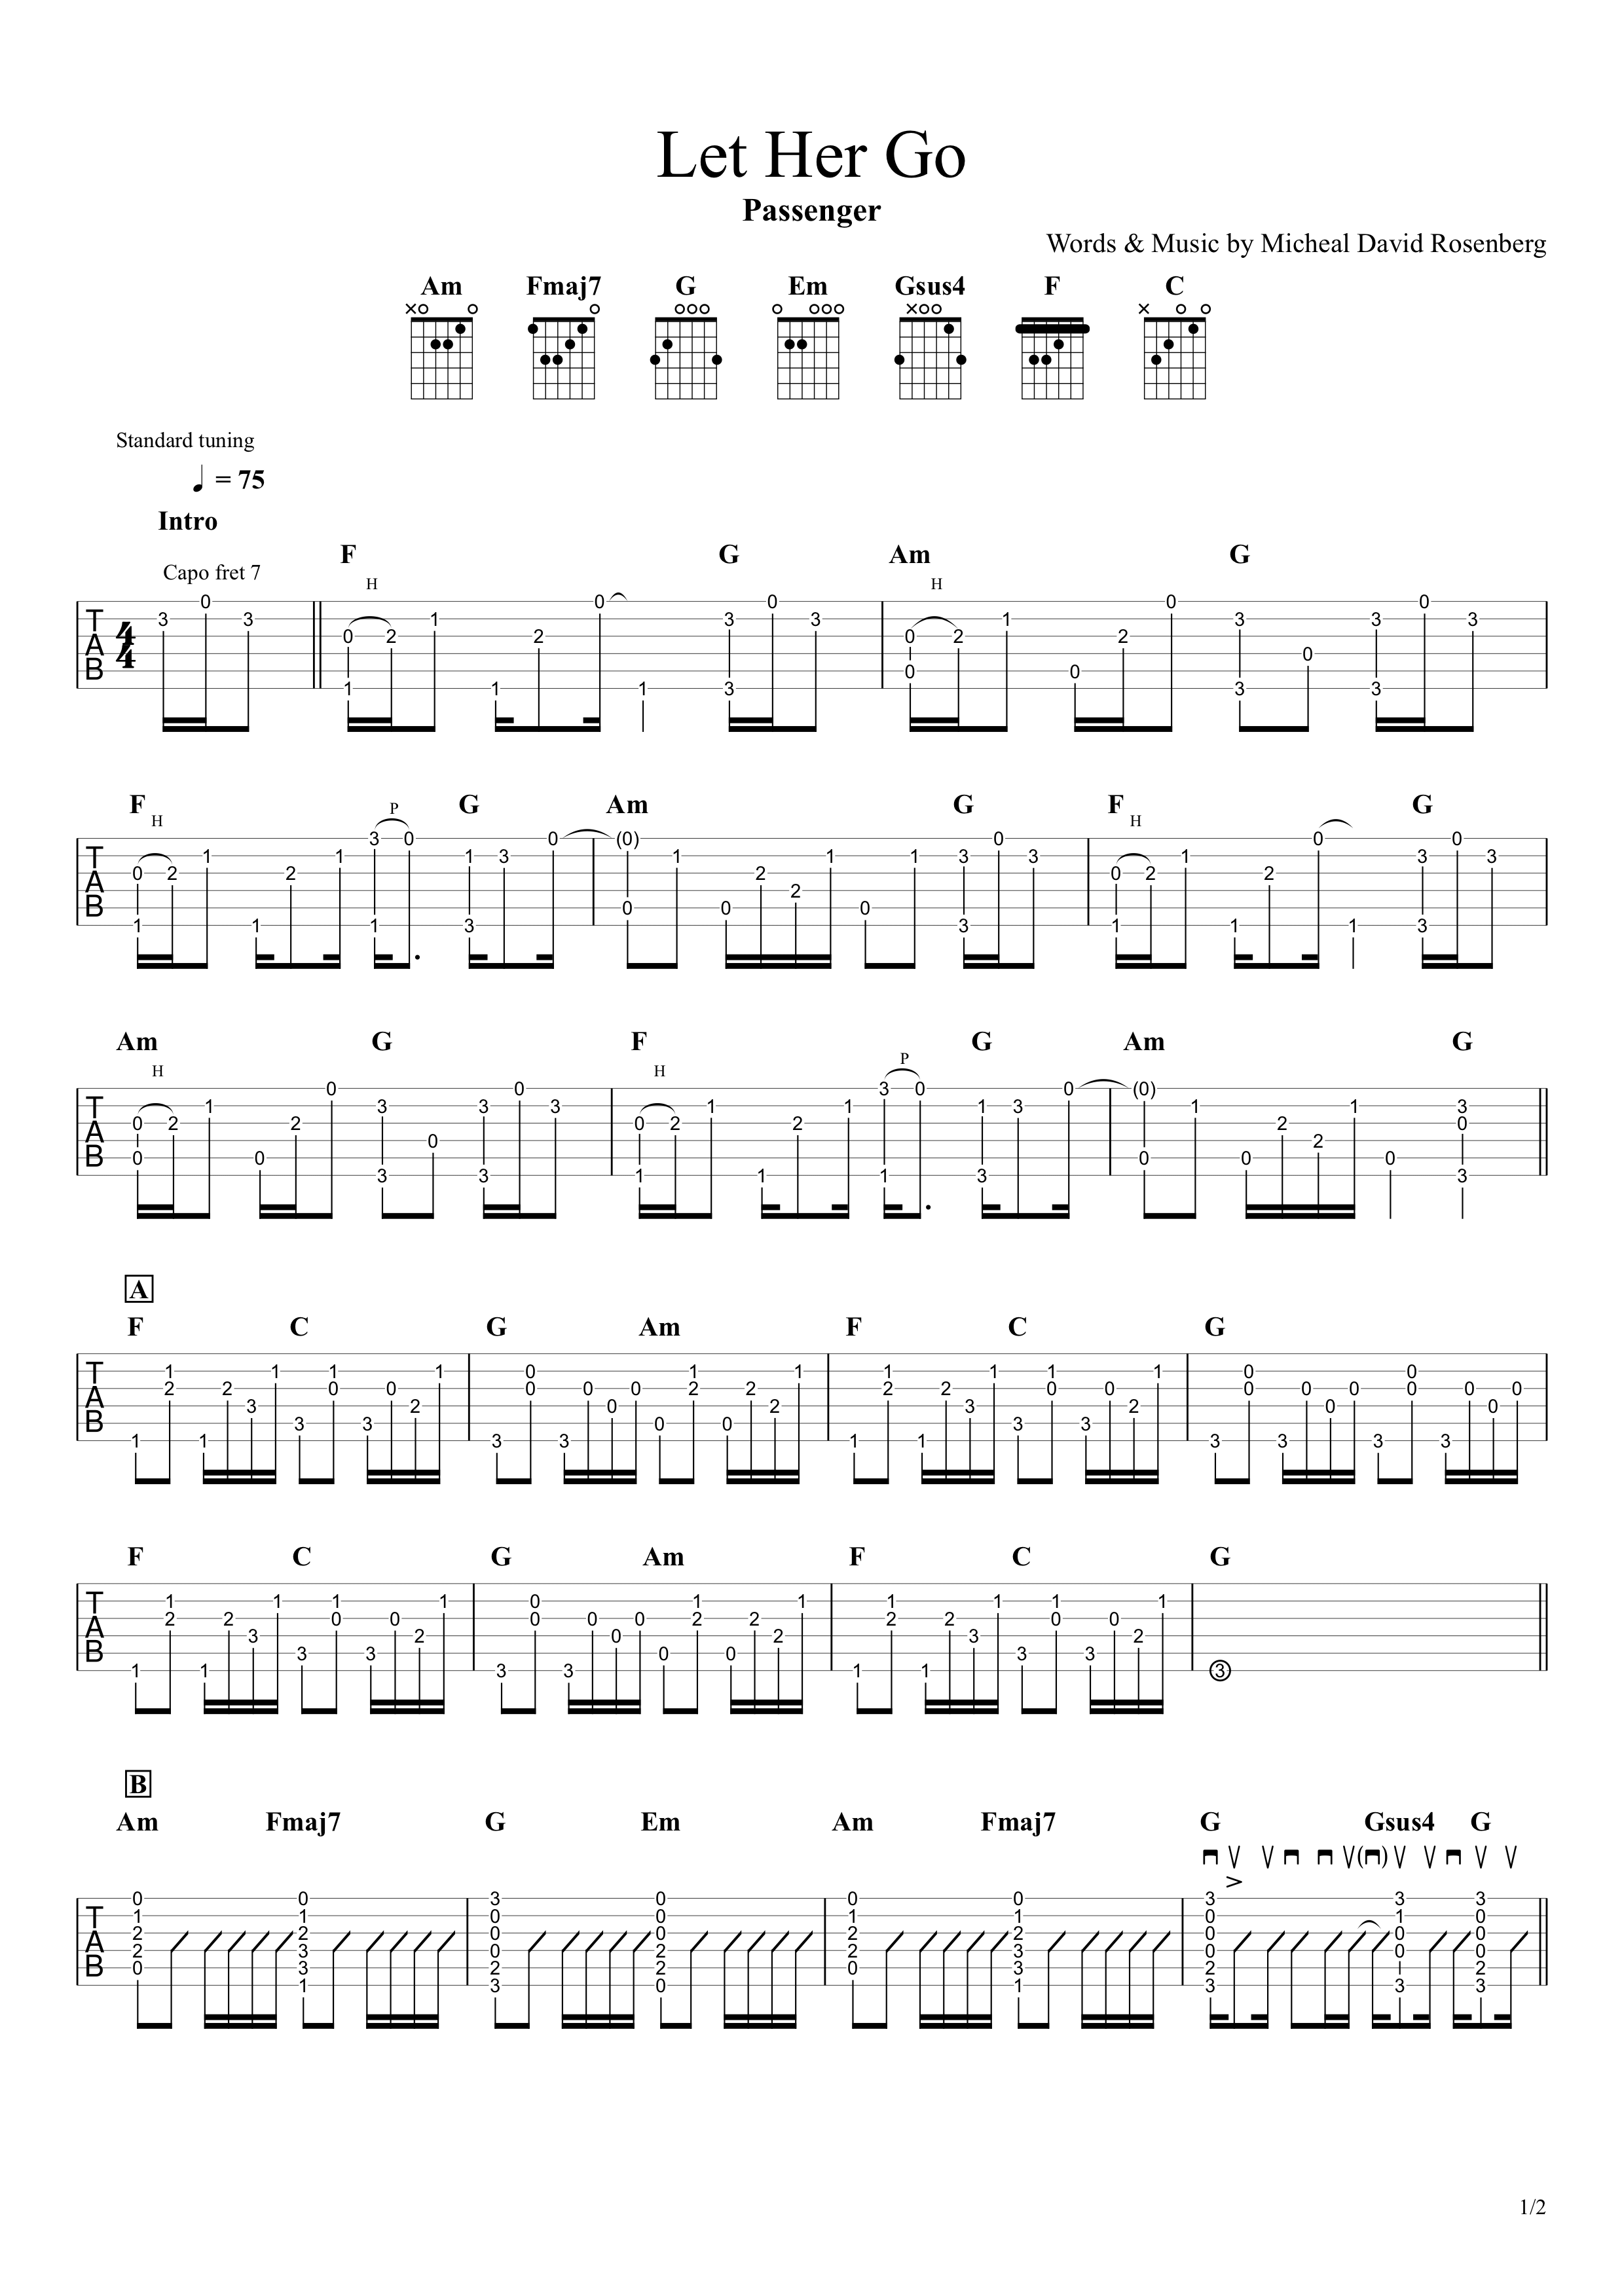 Let Her Go/Passenger ギタータブ譜 アルペジオちょい簡単Ver.01